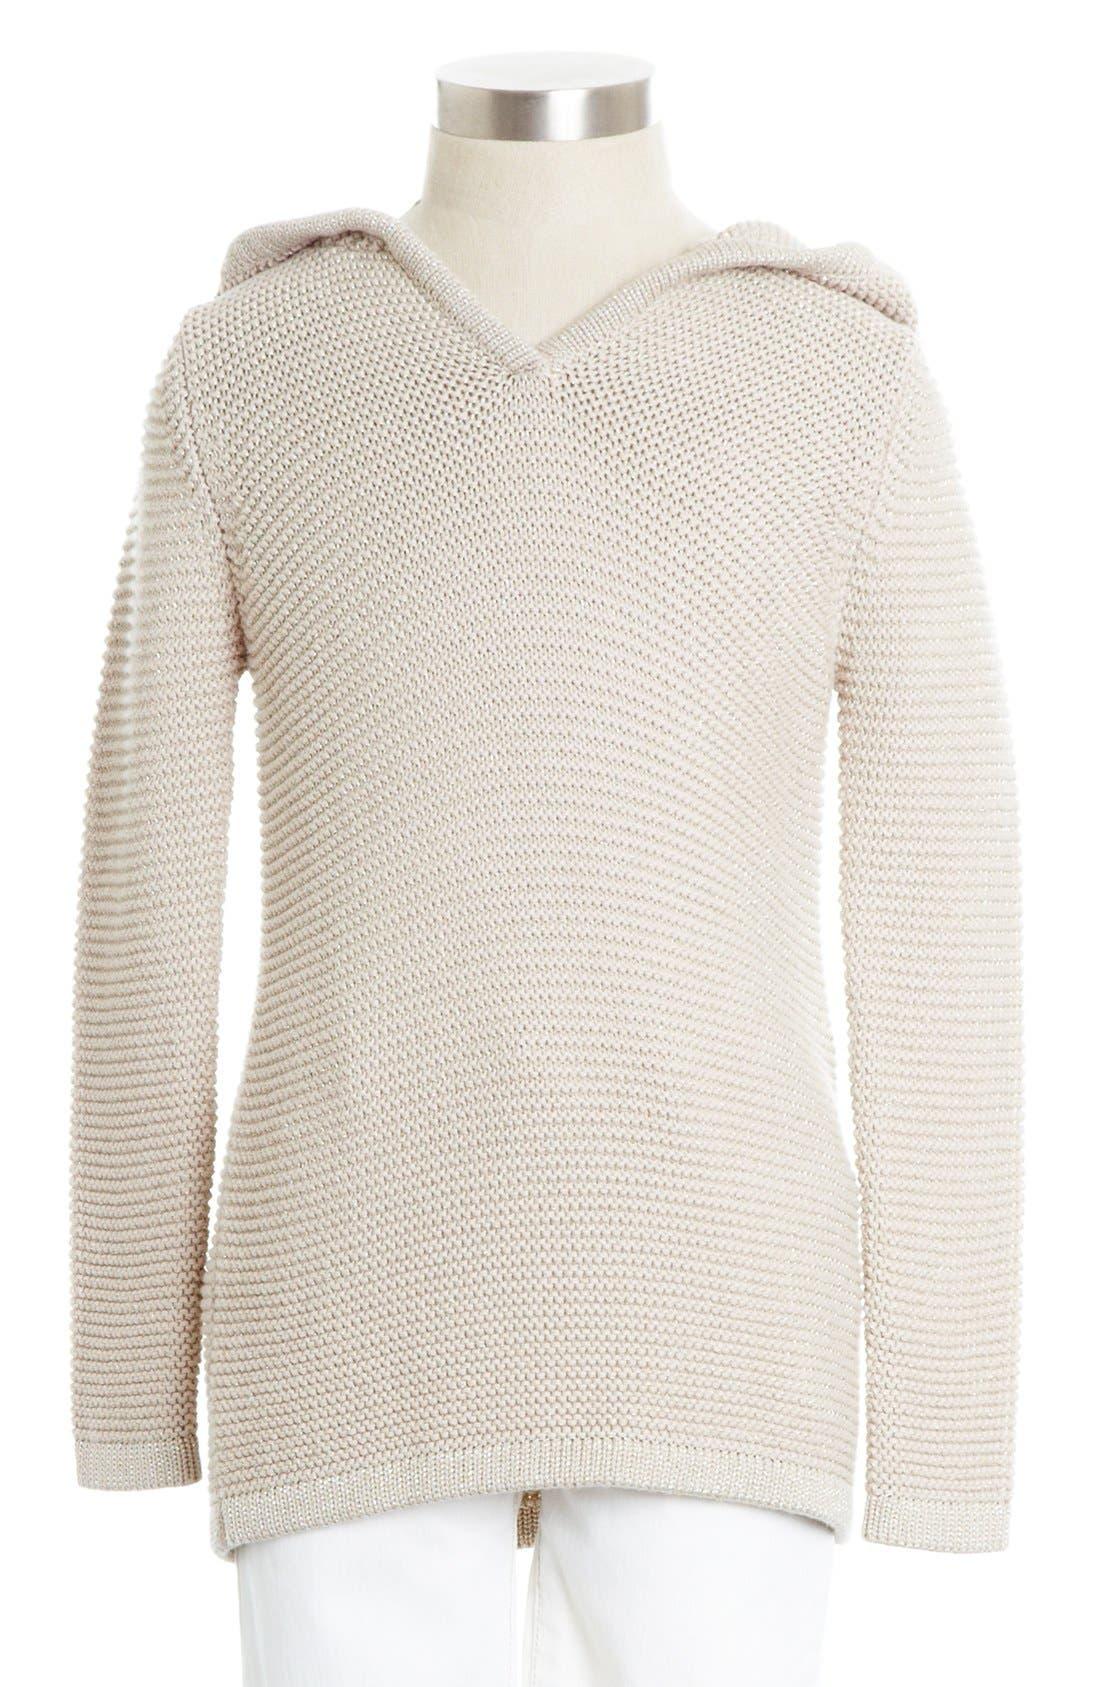 Alternate Image 1 Selected - Peek 'Becca' Hooded Sweater (Toddler Girls, Little Girls & Big Girls)